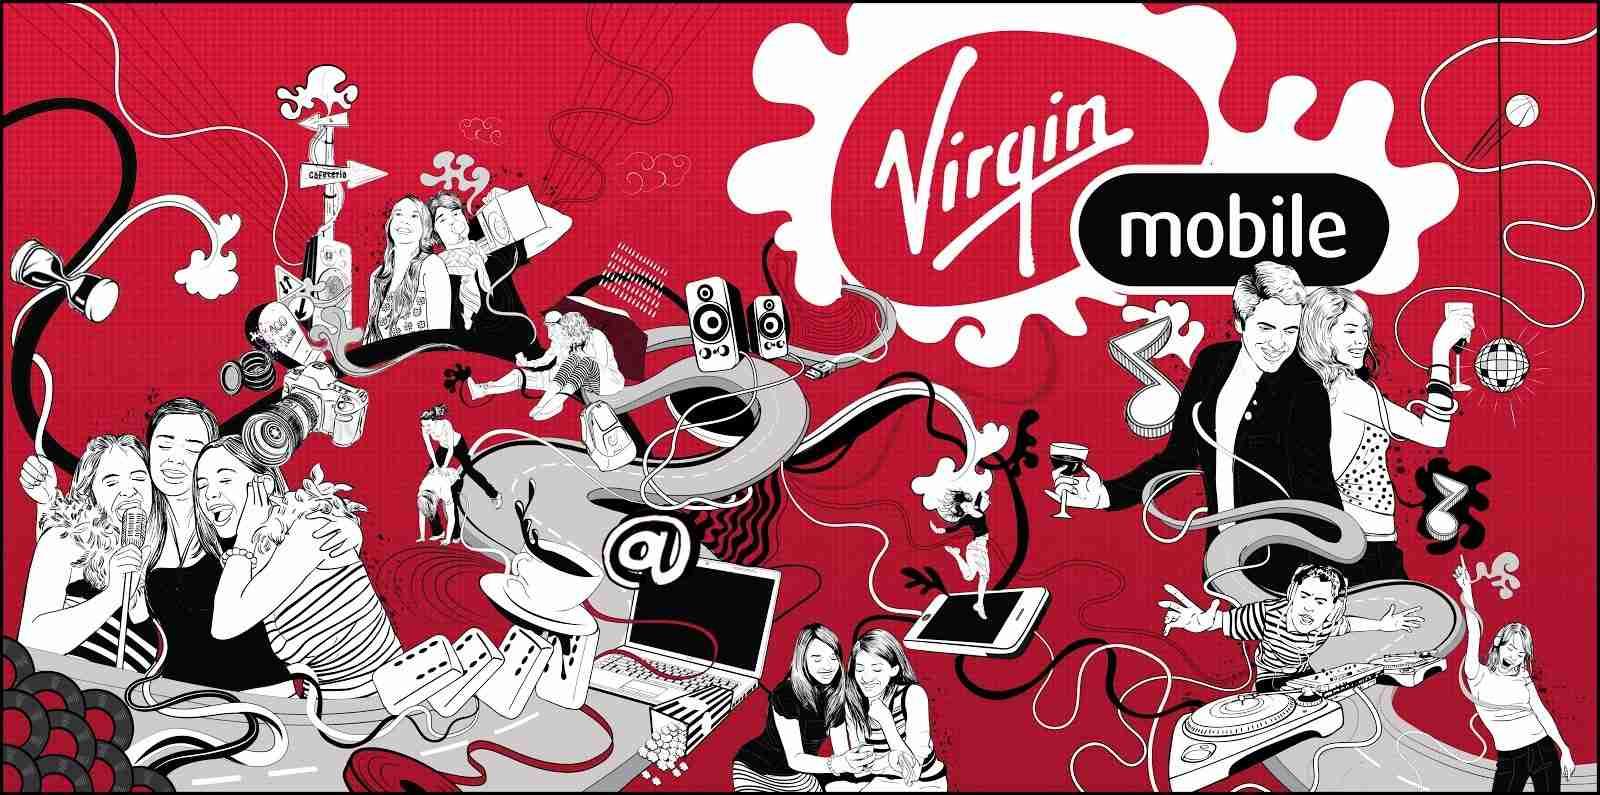 virgin mobile in Canada